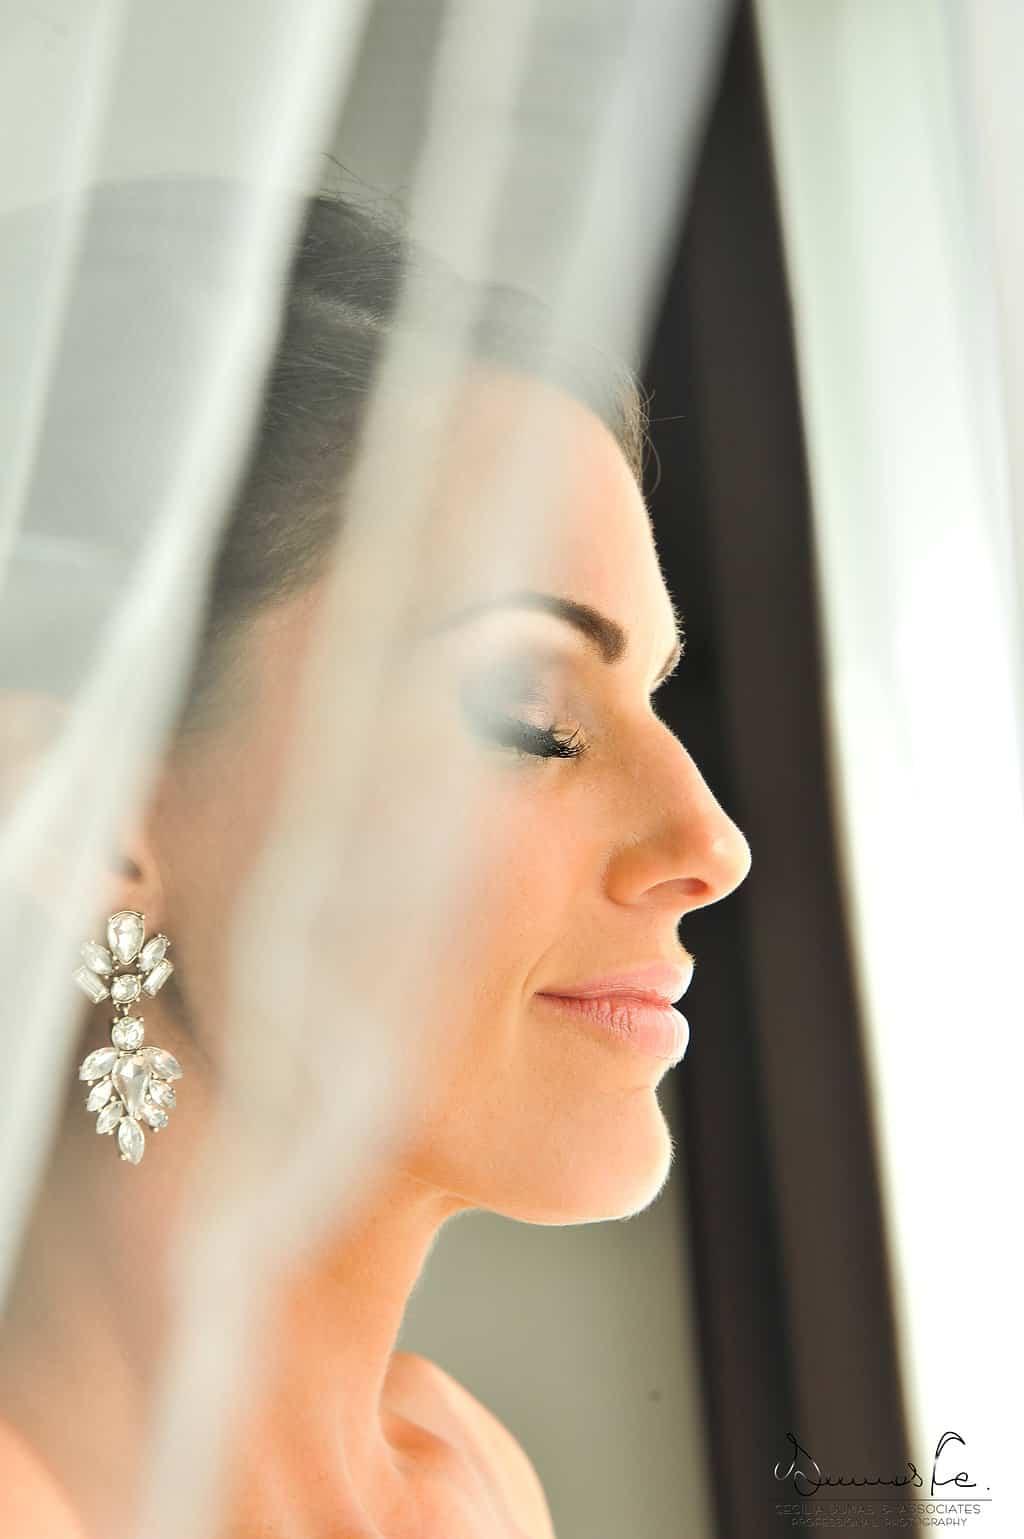 islamujeres-zama-weddingphotography-lindseysalvatore20